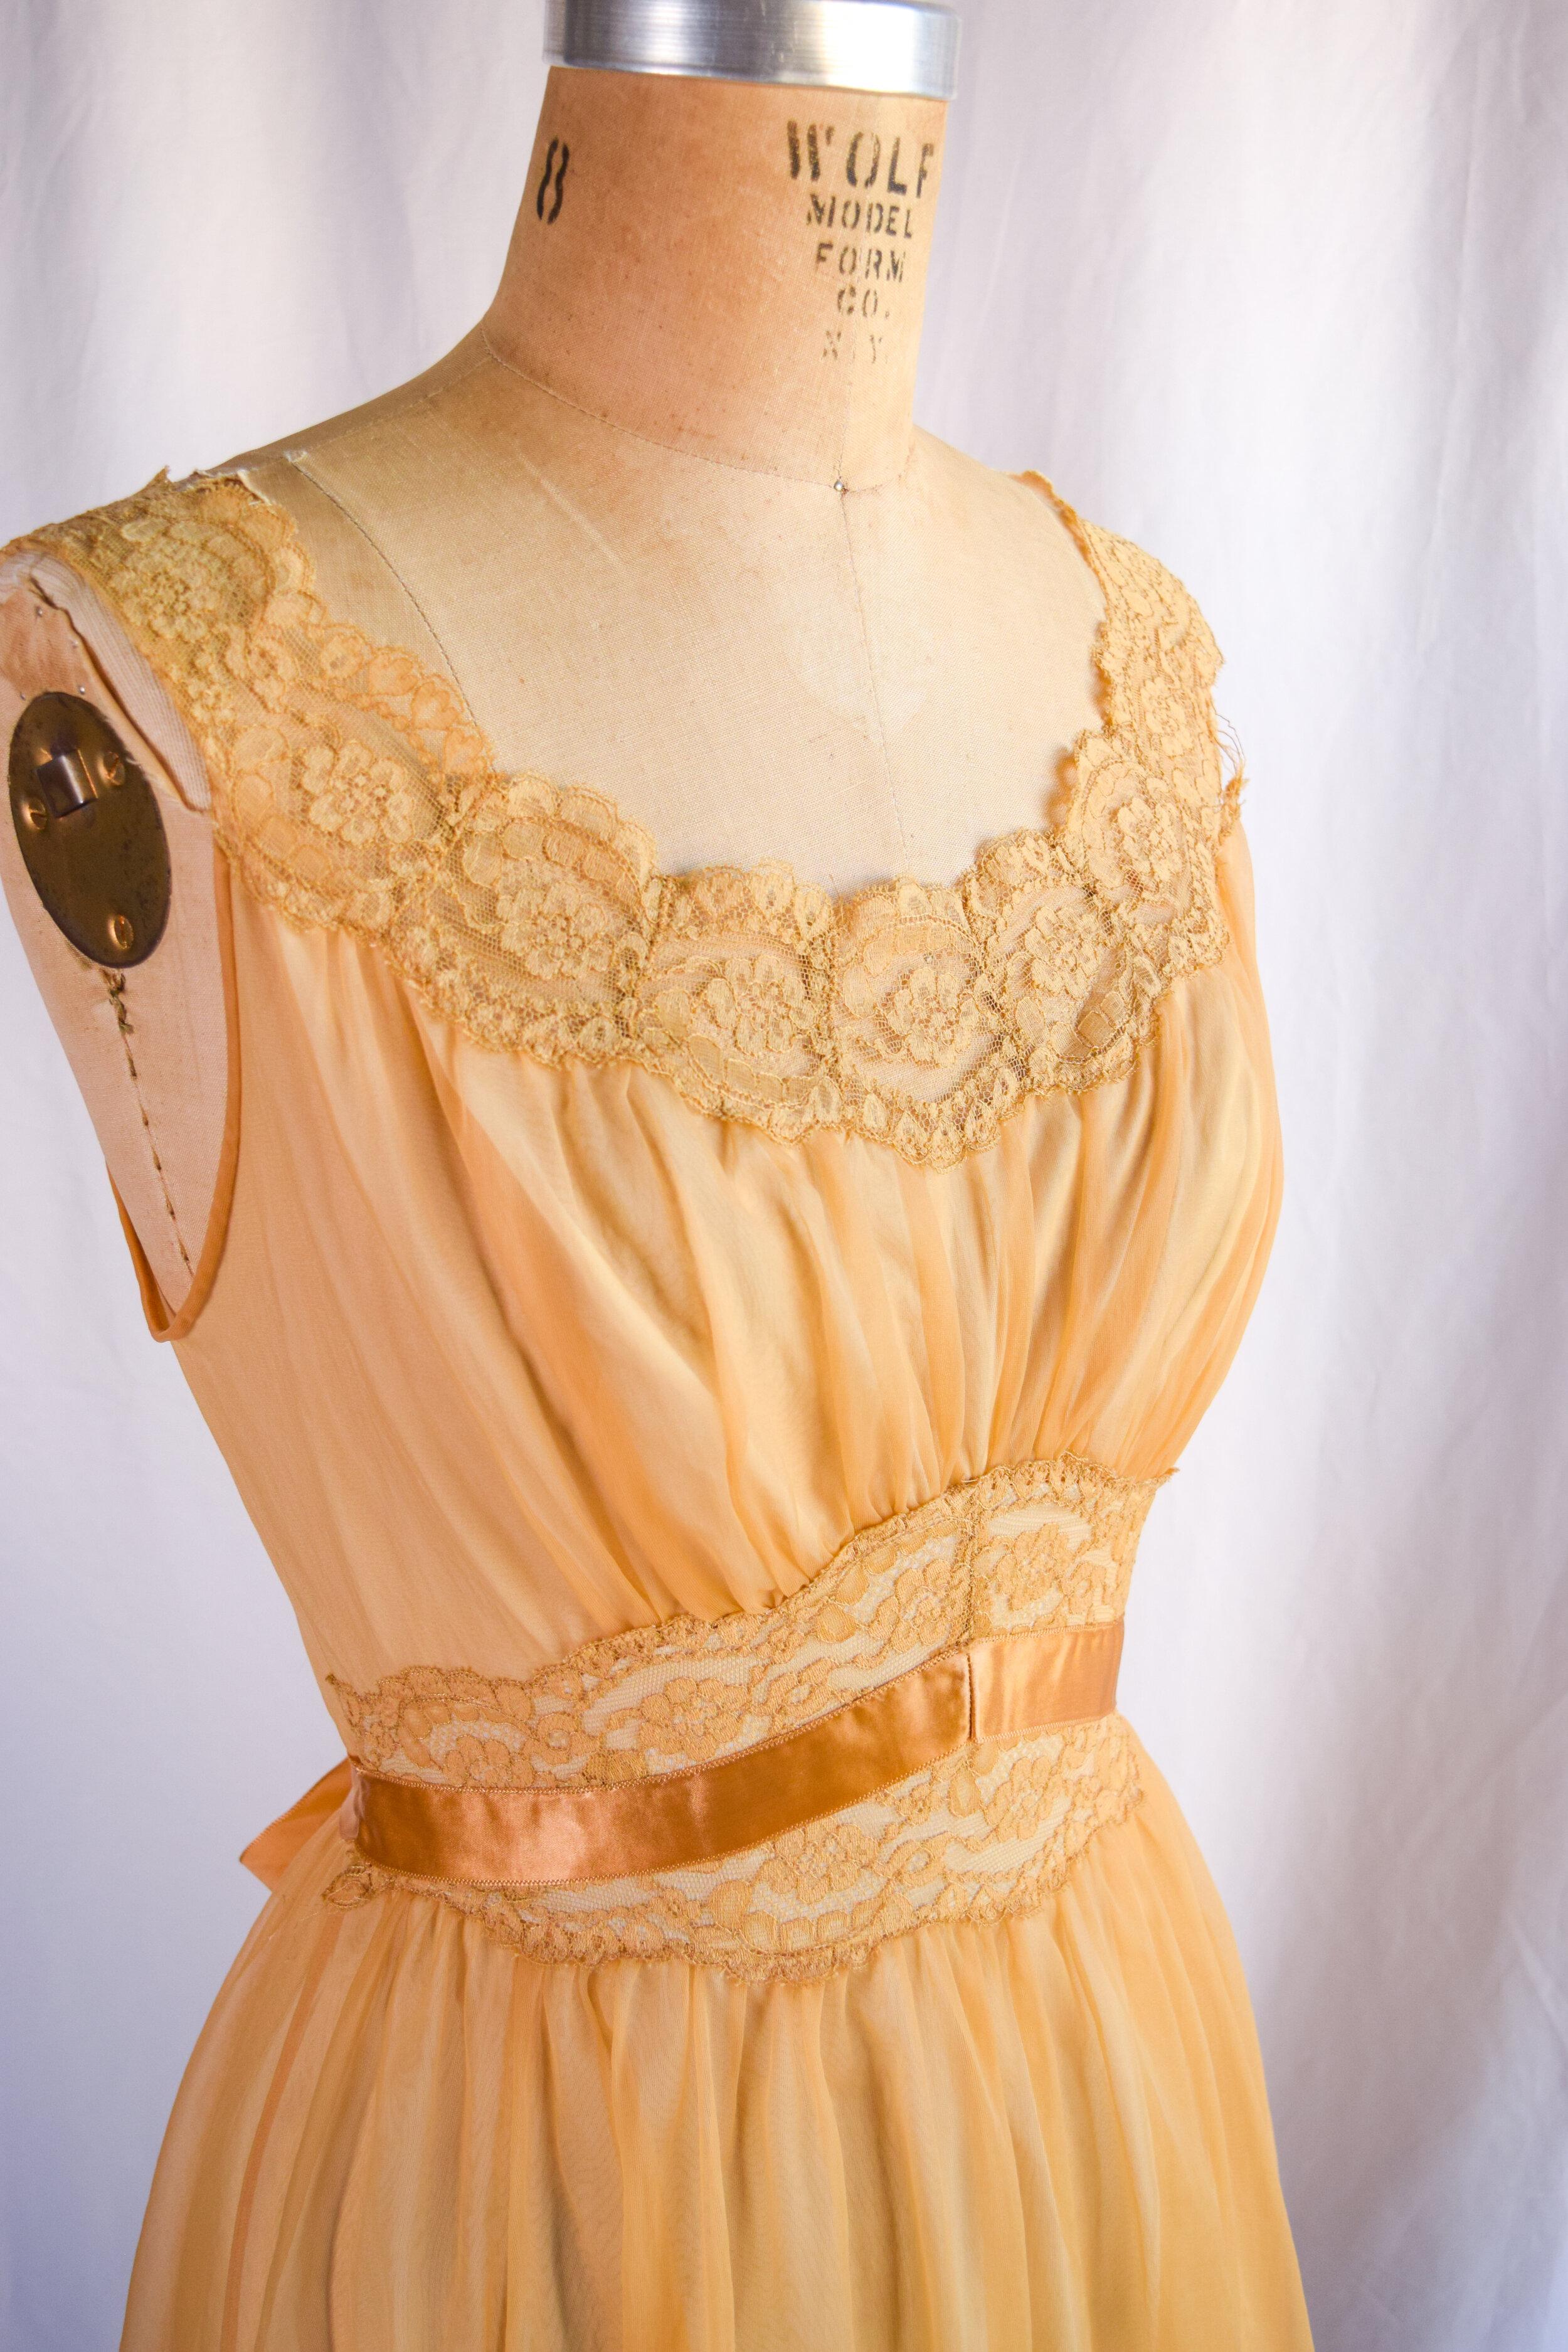 Vintage 1960s Yellow Nightgown by Vanity Fair in sz M